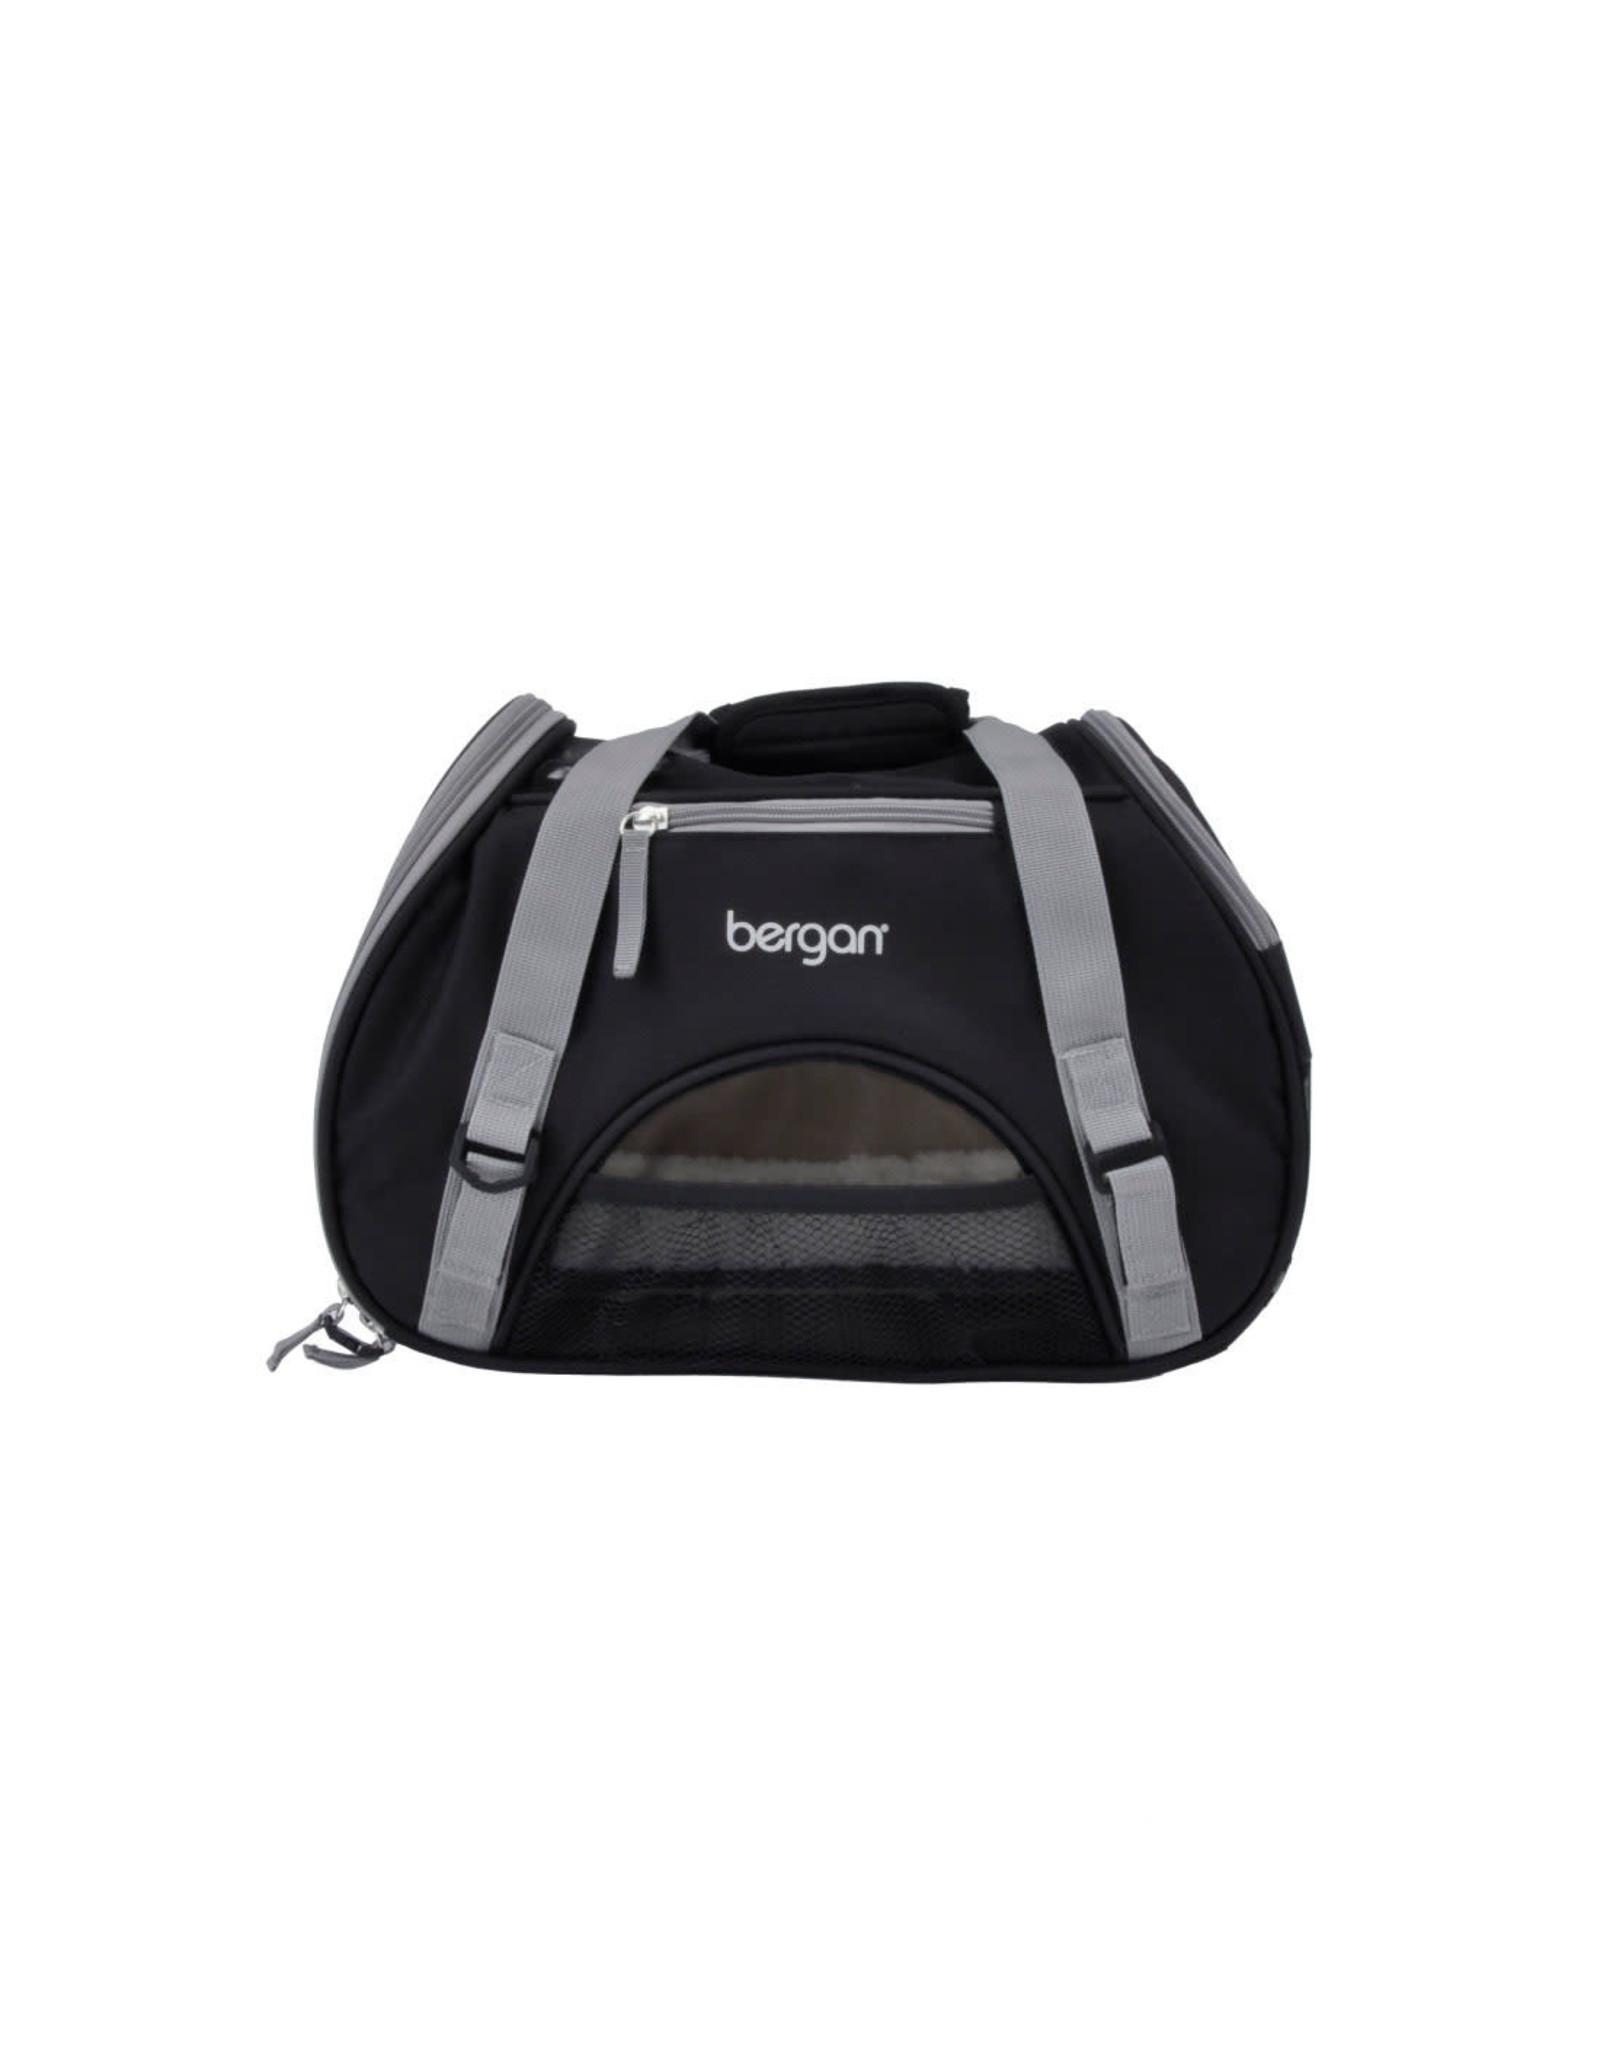 Coastal Pet Products Bergan Comfort Carrier (LG)